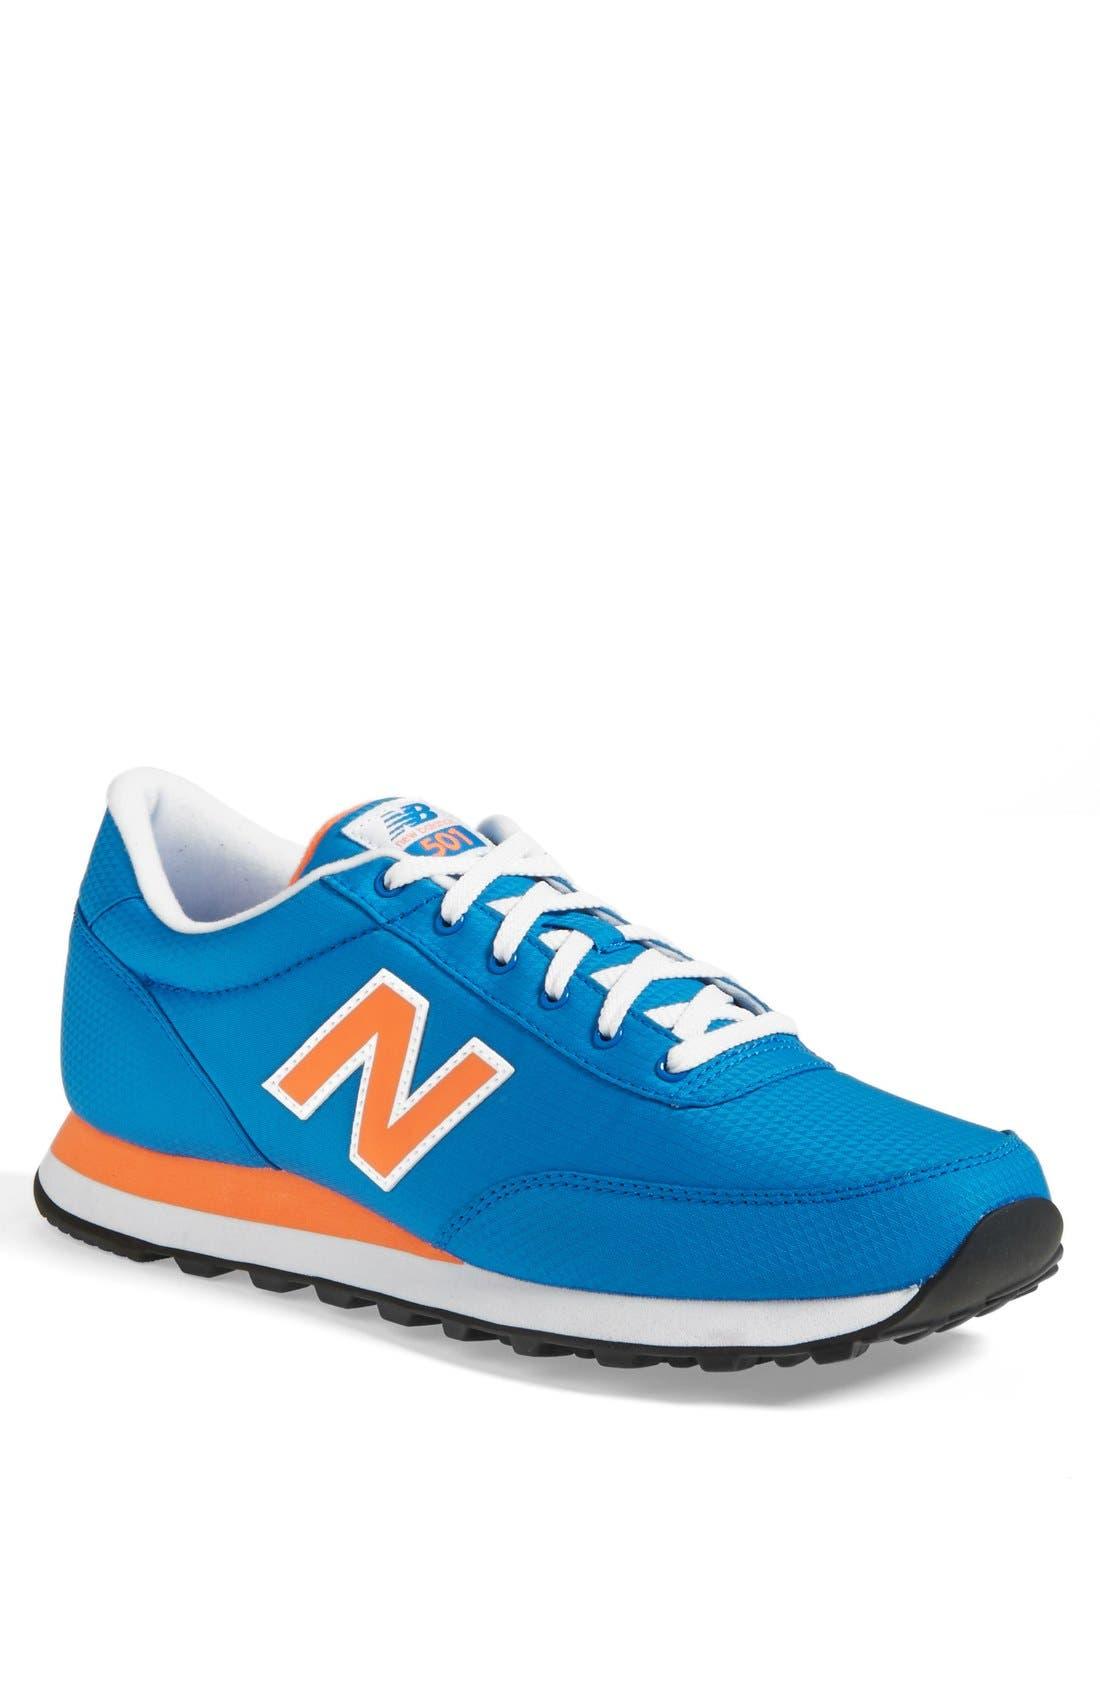 Alternate Image 1 Selected - New Balance '501' Sneaker (Men) (Online Only)